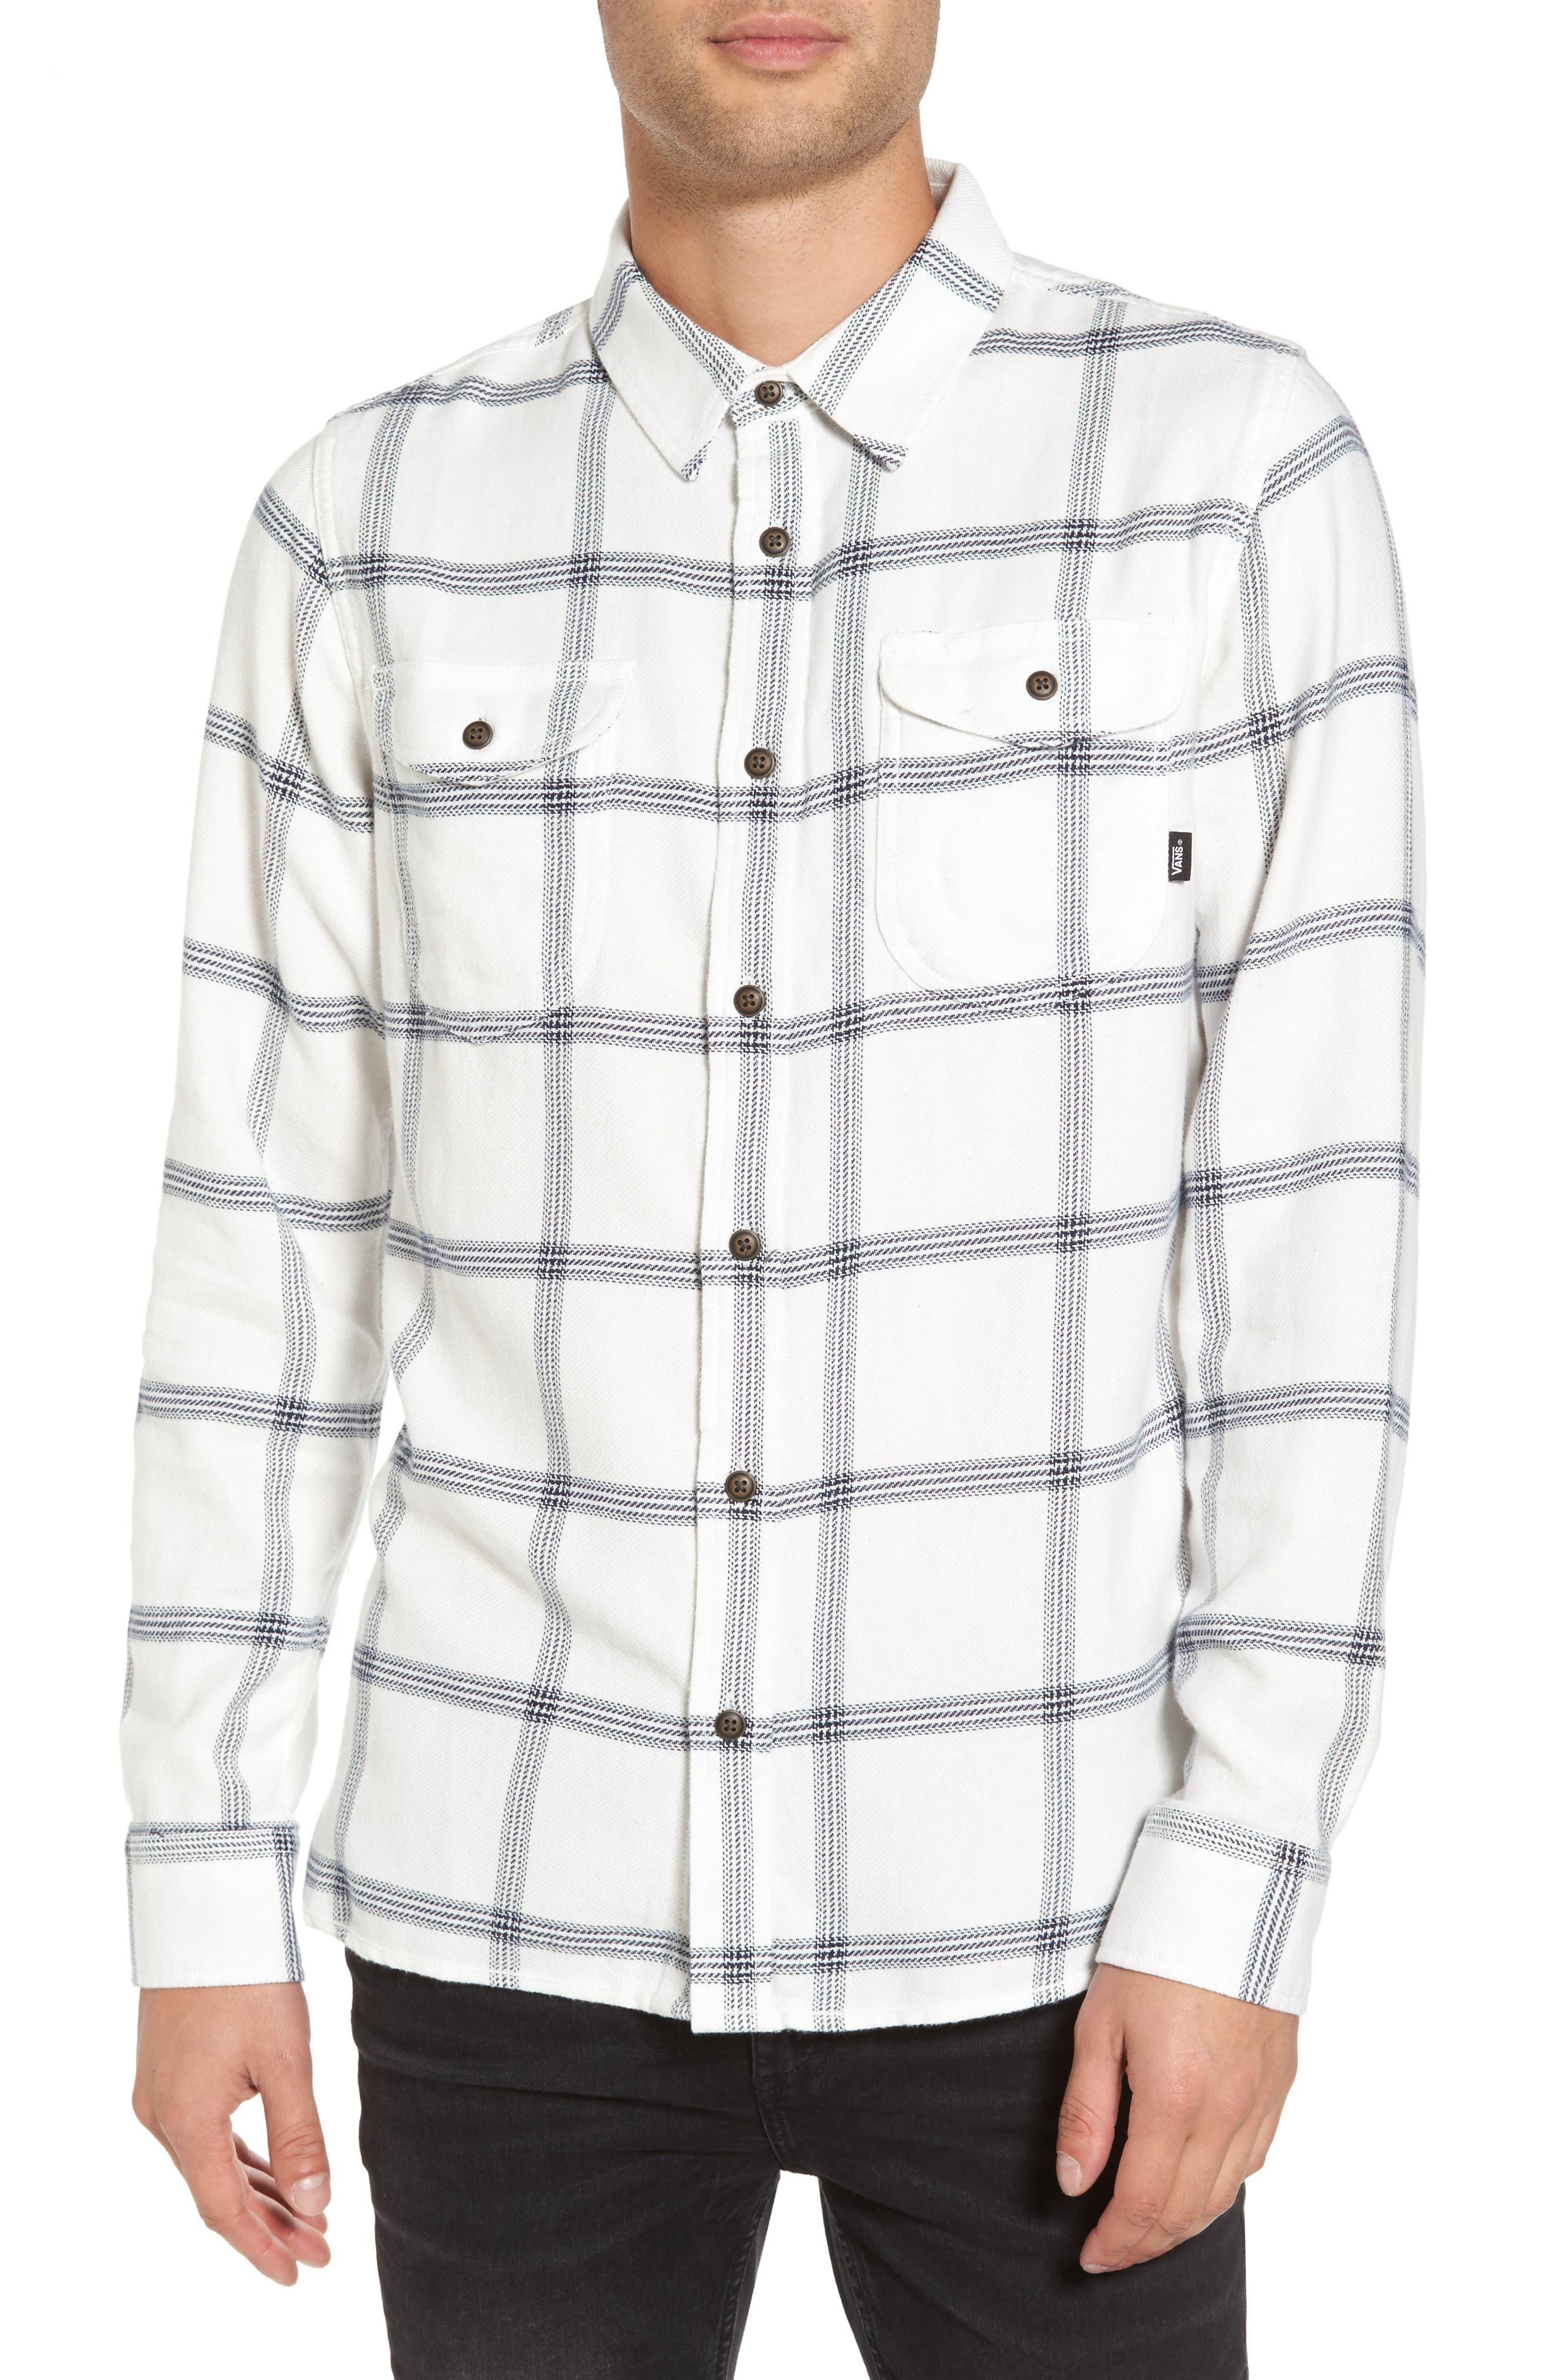 Alternate Image 1 Selected - Vans Wayland II Flannel Sport Shirt